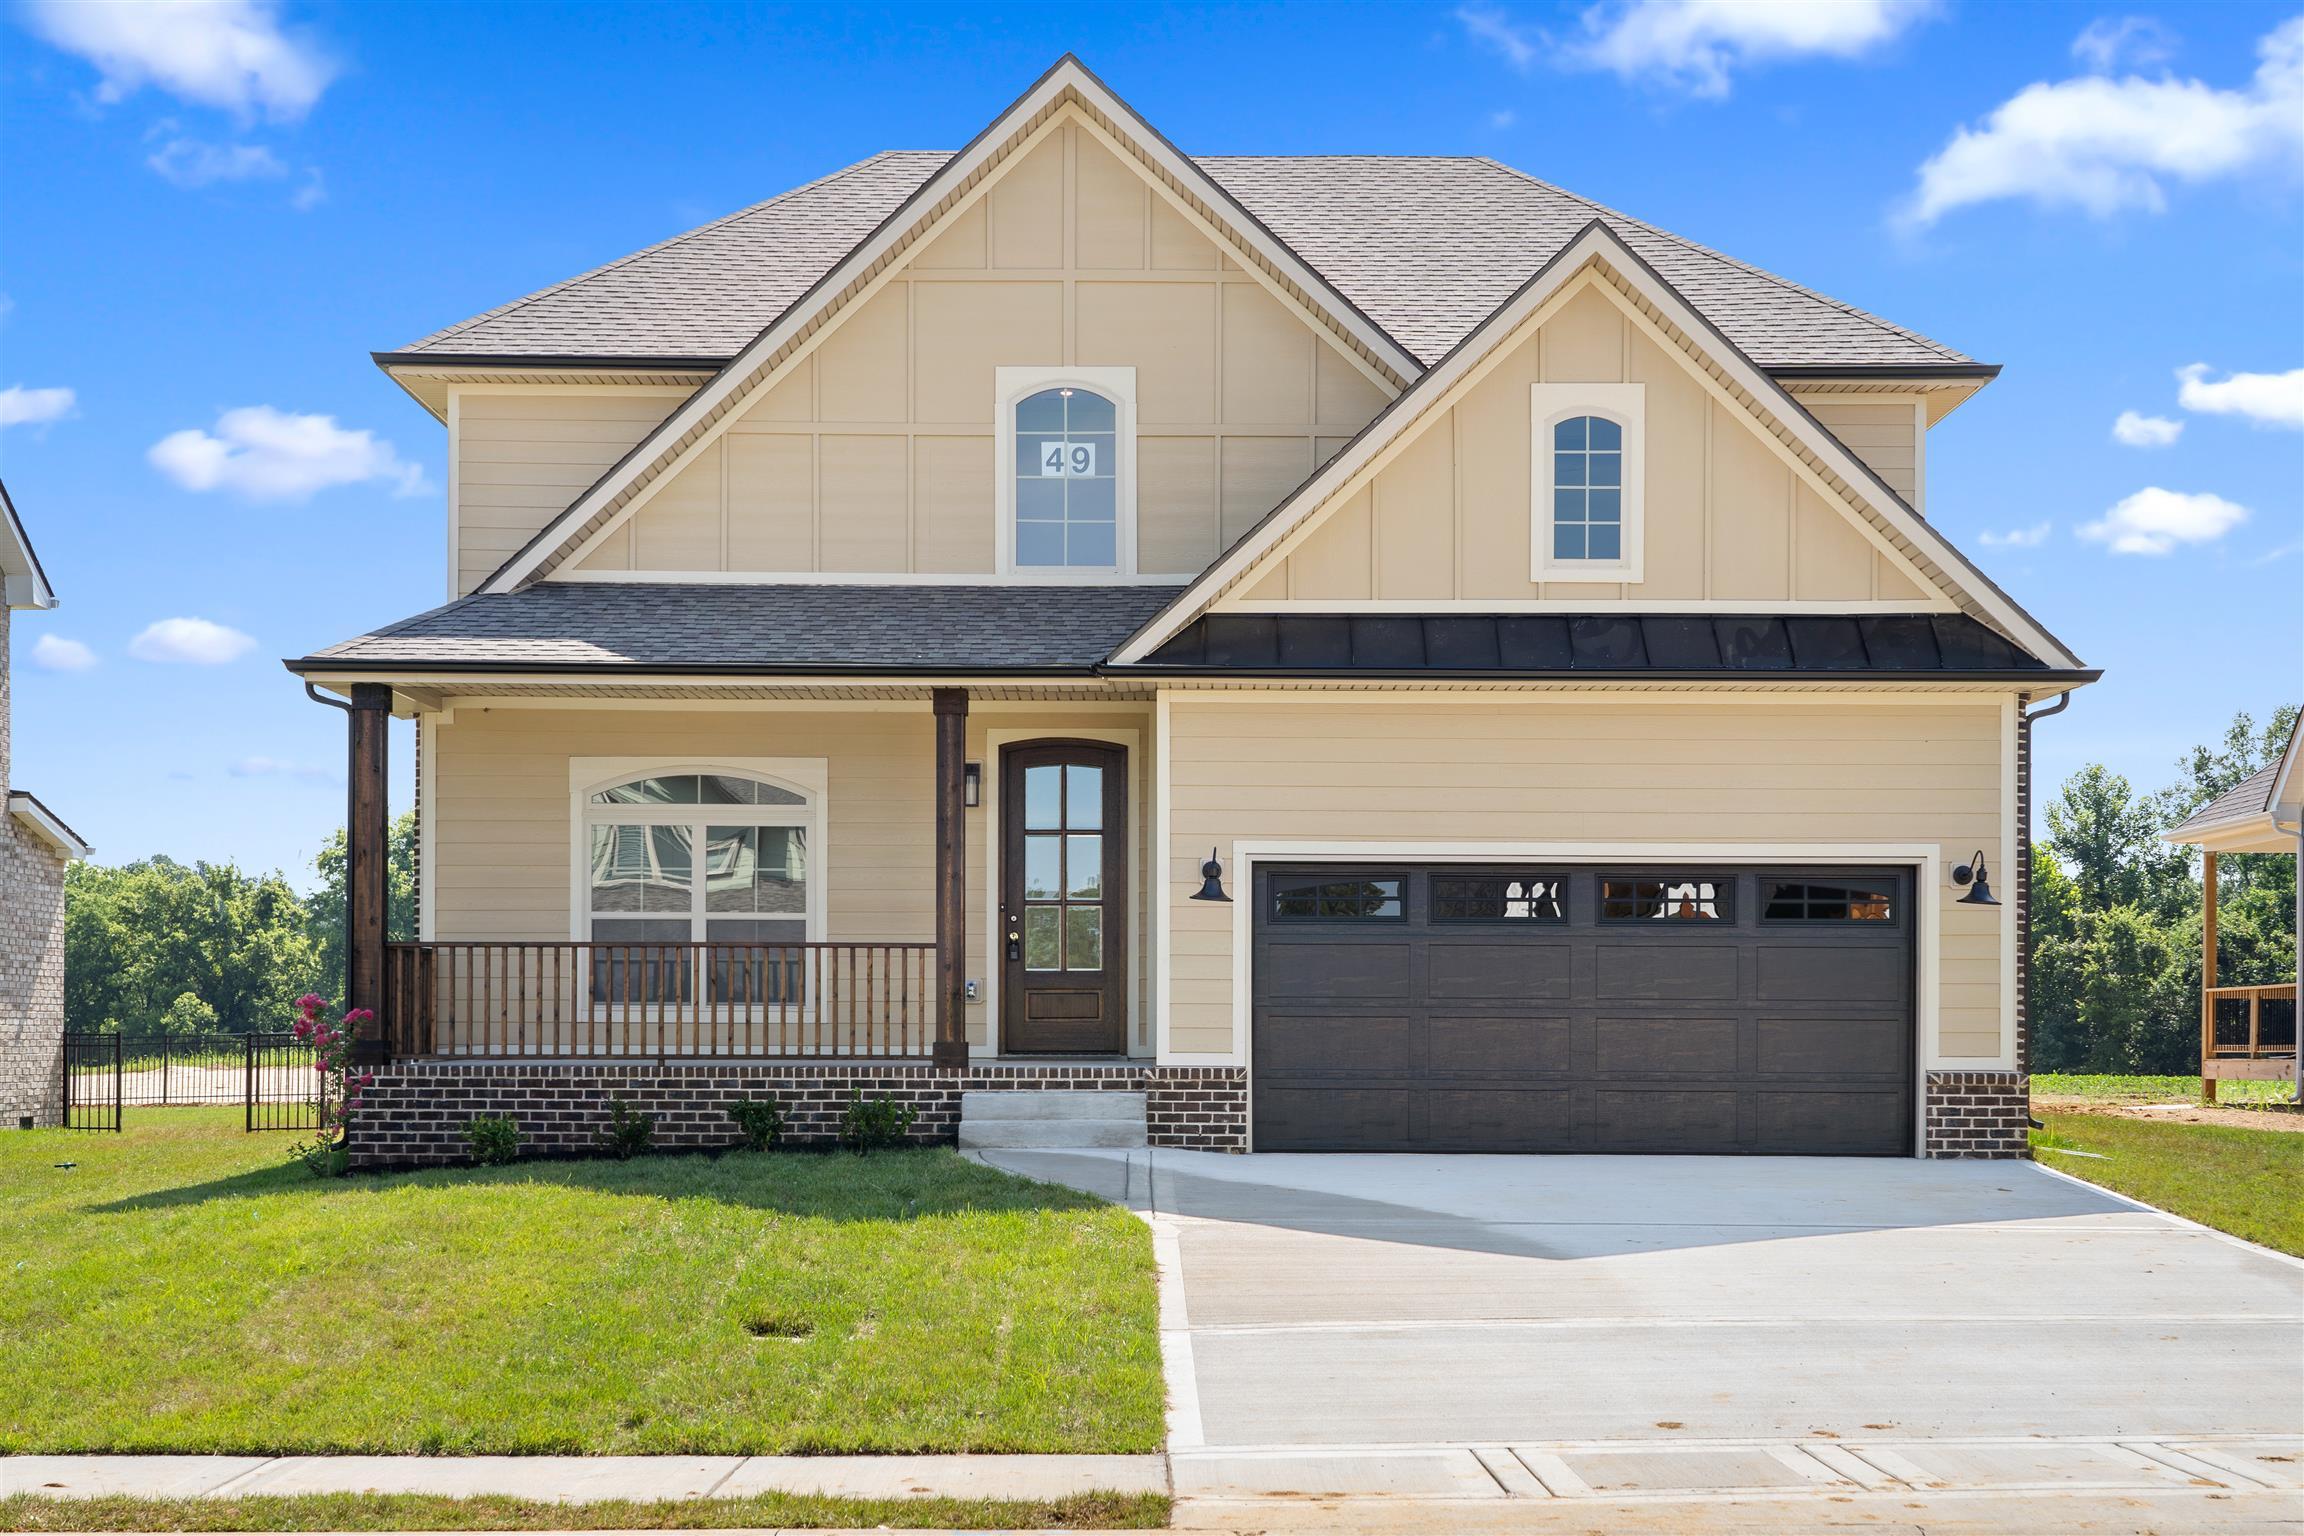 344 Lowline Dr. - lot 85, Clarksville, TN 37043 - Clarksville, TN real estate listing